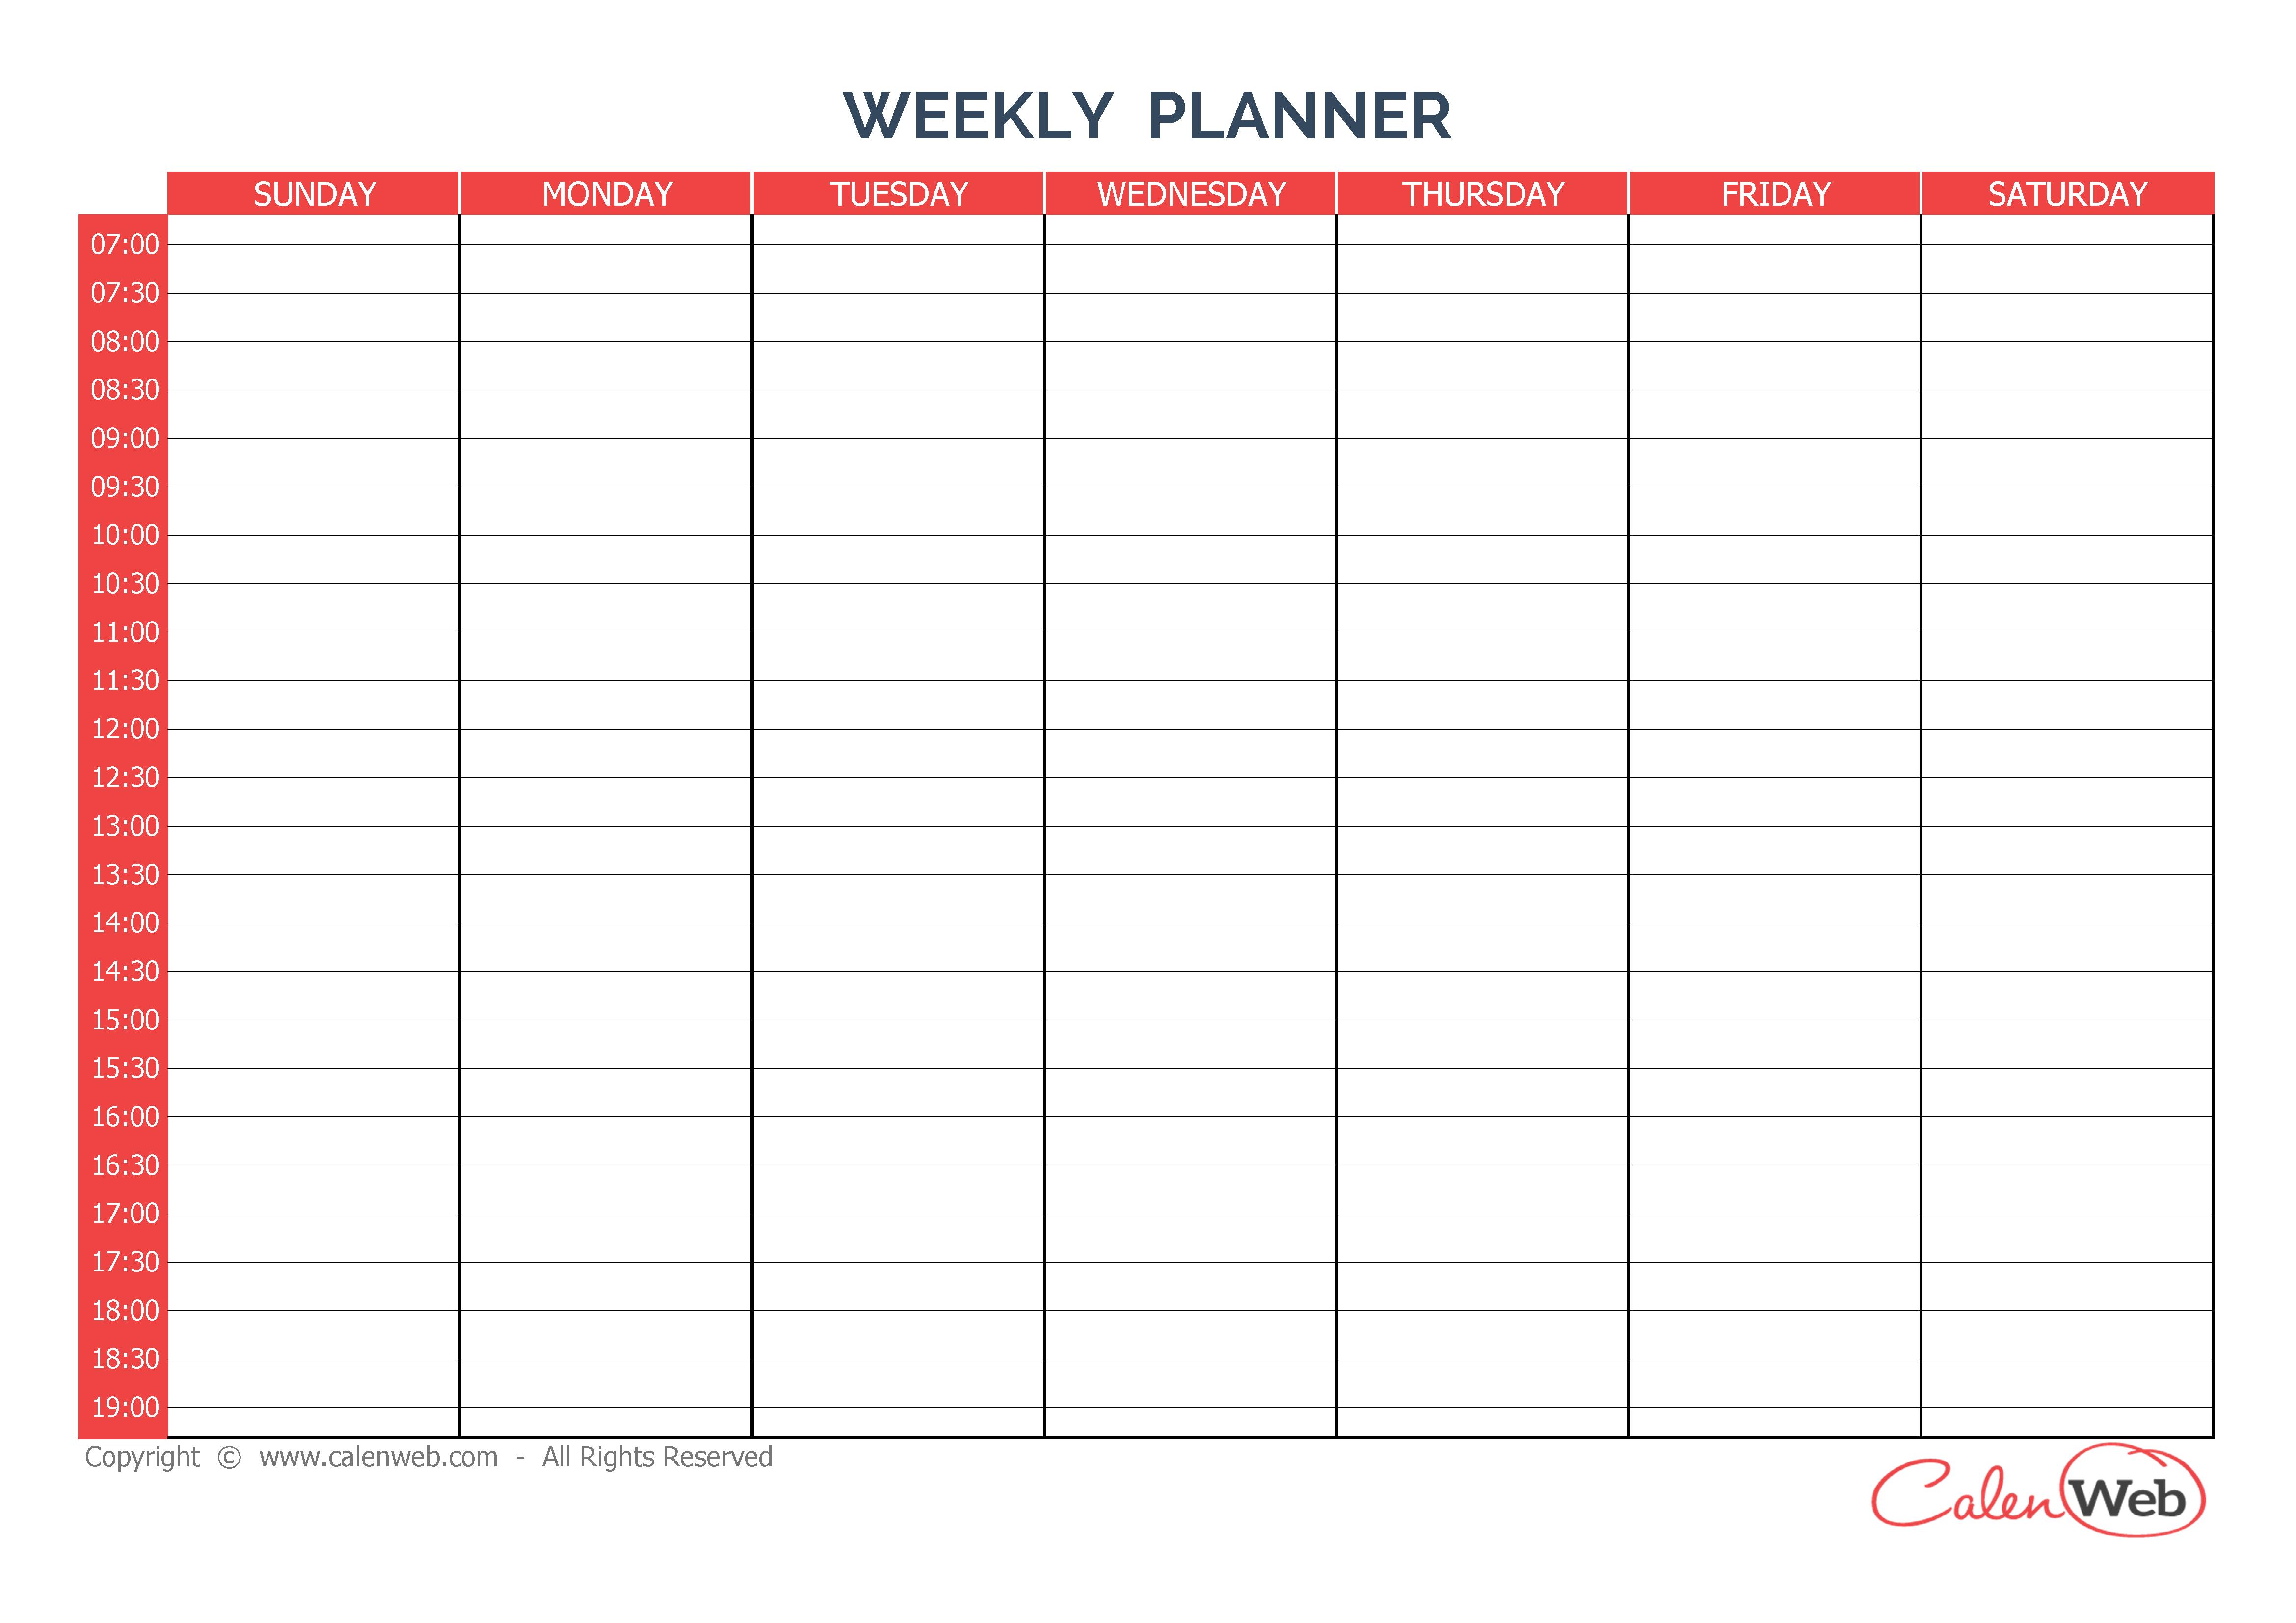 Calendriers Hebdomadaires - Calenweb Saturday Through Friday Calendar